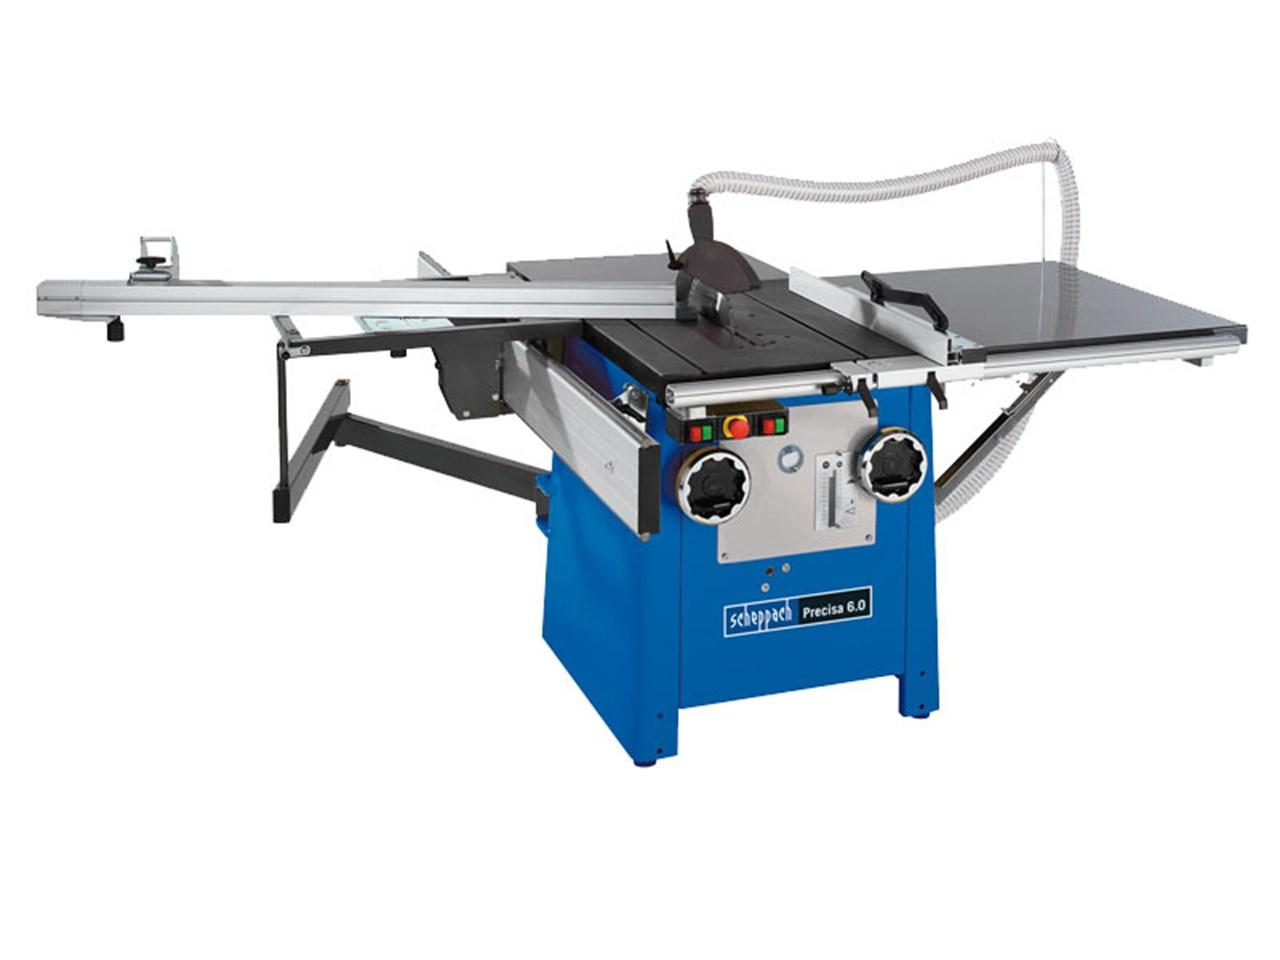 Brilliant Scheppach Precisa 6 0 230V Precisa Table Saw With 2M Stc Tle Twe Kit Lamtechconsult Wood Chair Design Ideas Lamtechconsultcom